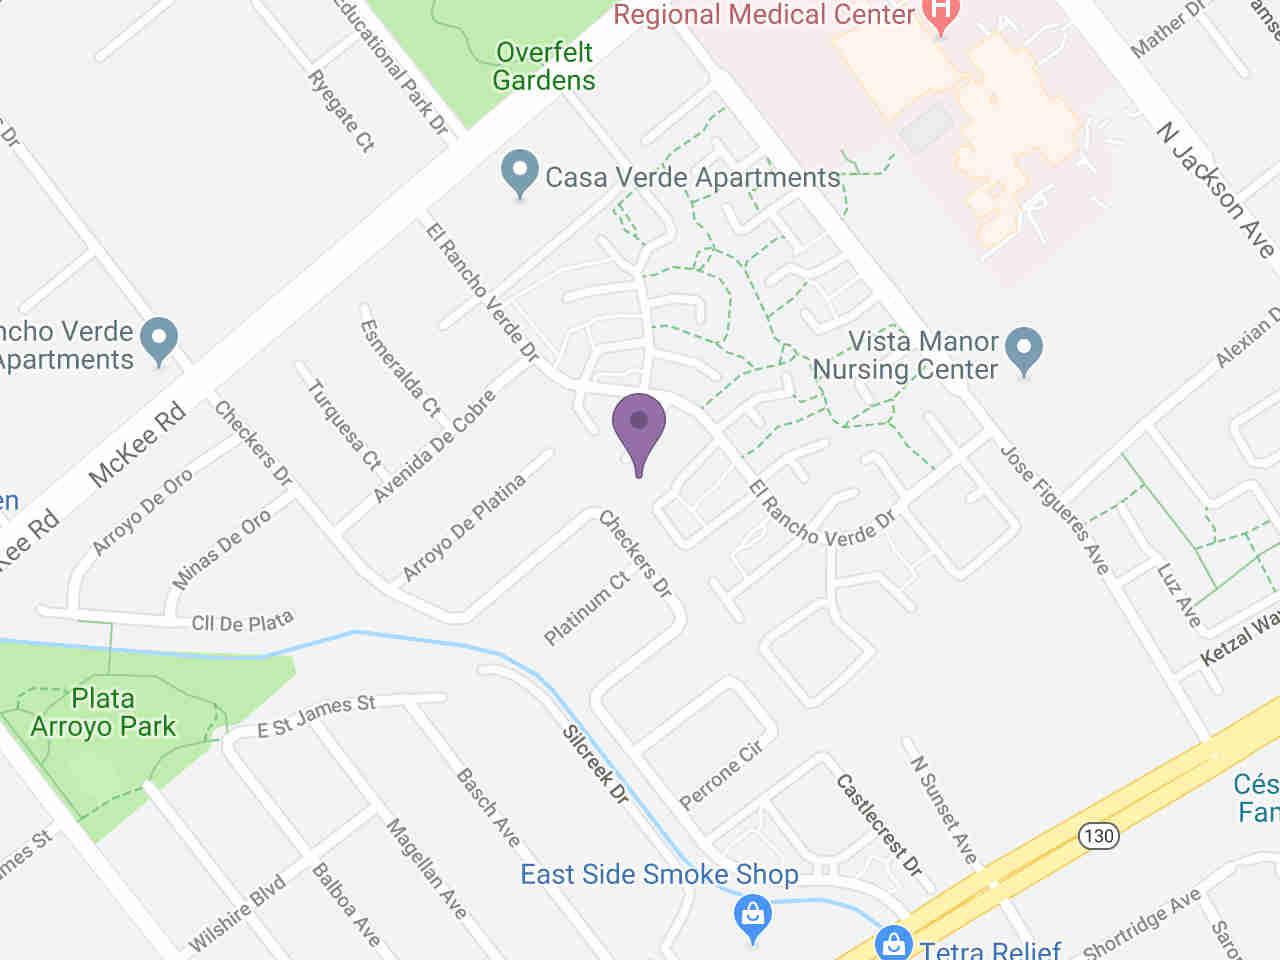 Location:, 190 Checkers DR San Jose, CA, 95116